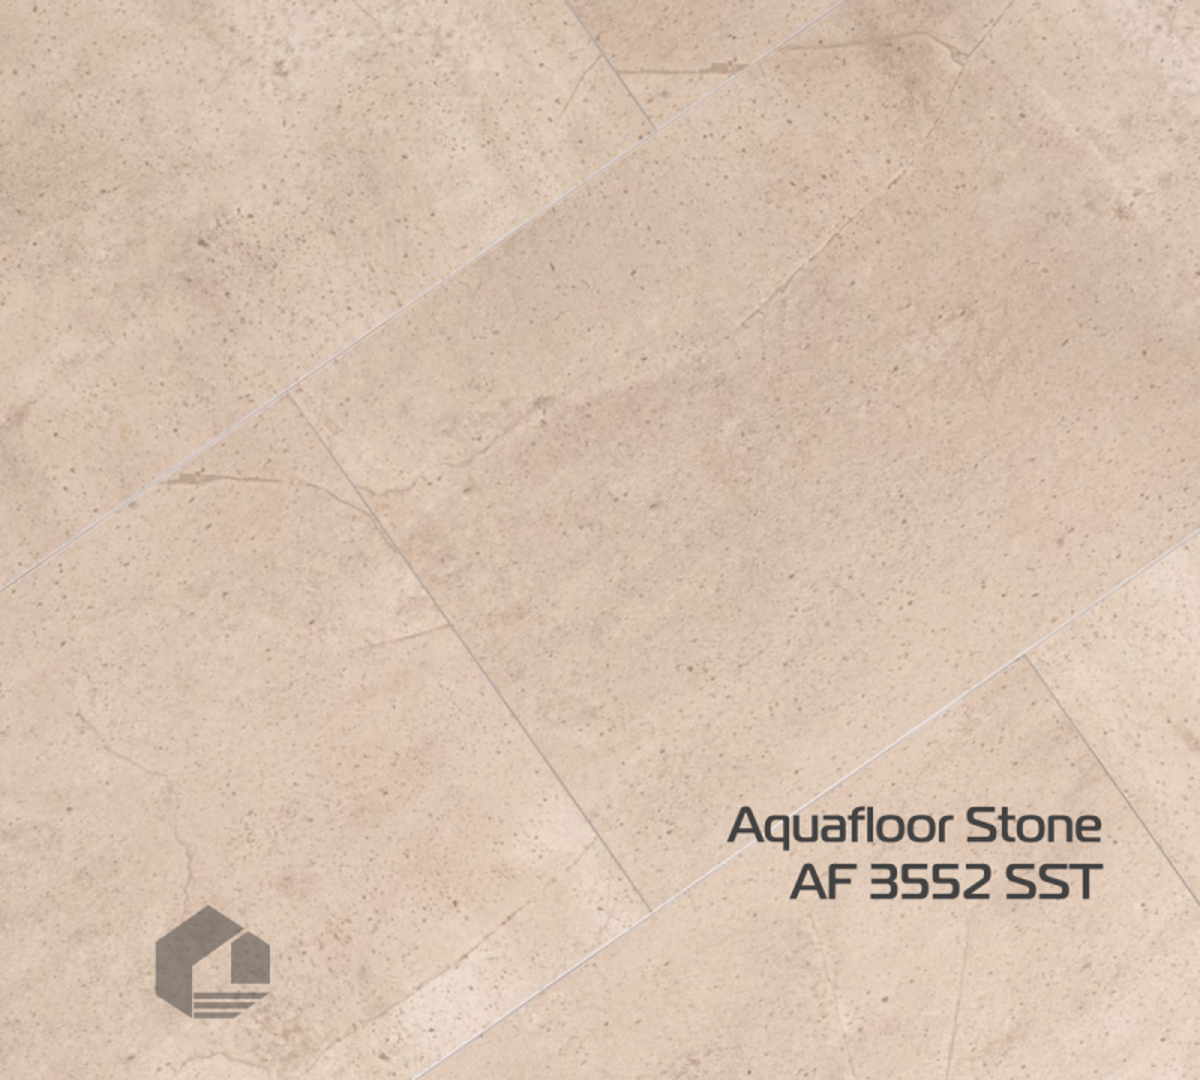 Кварцевый ламинат Aquafloor STONE AF 3552SST (610*305*3,5 мм) 10шт/1,86м2